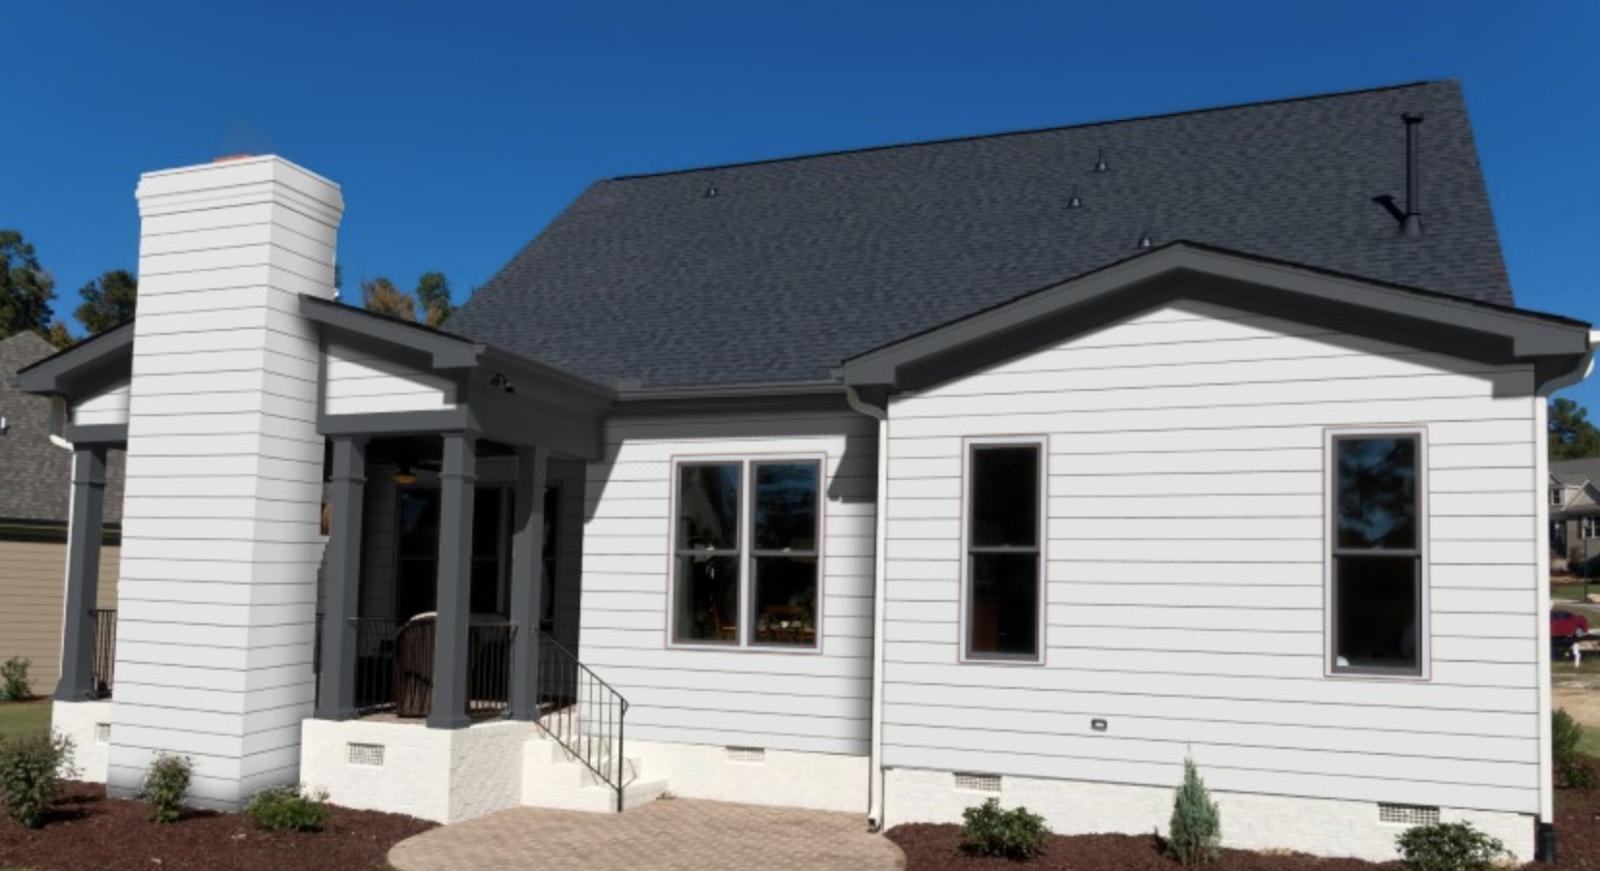 Accentuate light house siding with grey trim allura cms - White house white trim ...